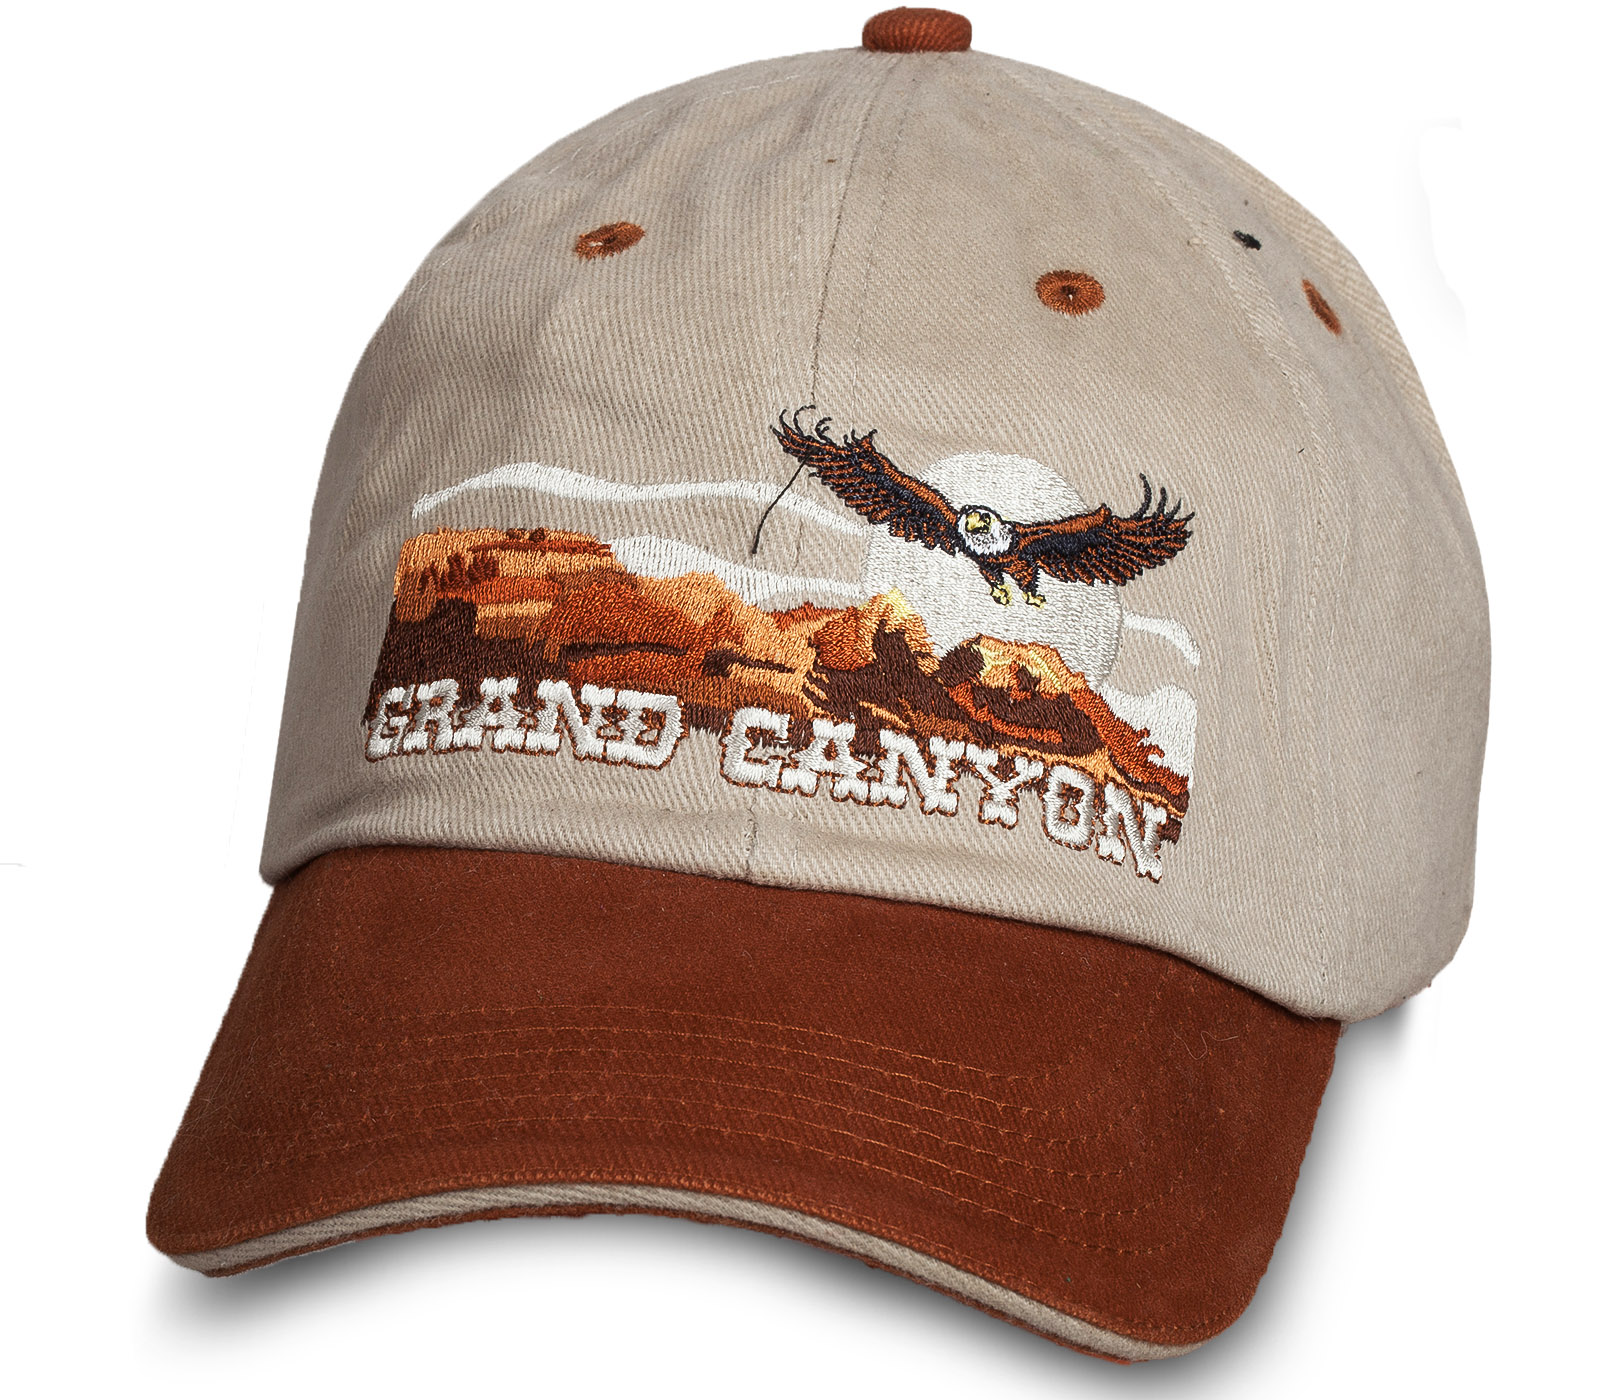 Эффектная бейсболка Grand Canyon.